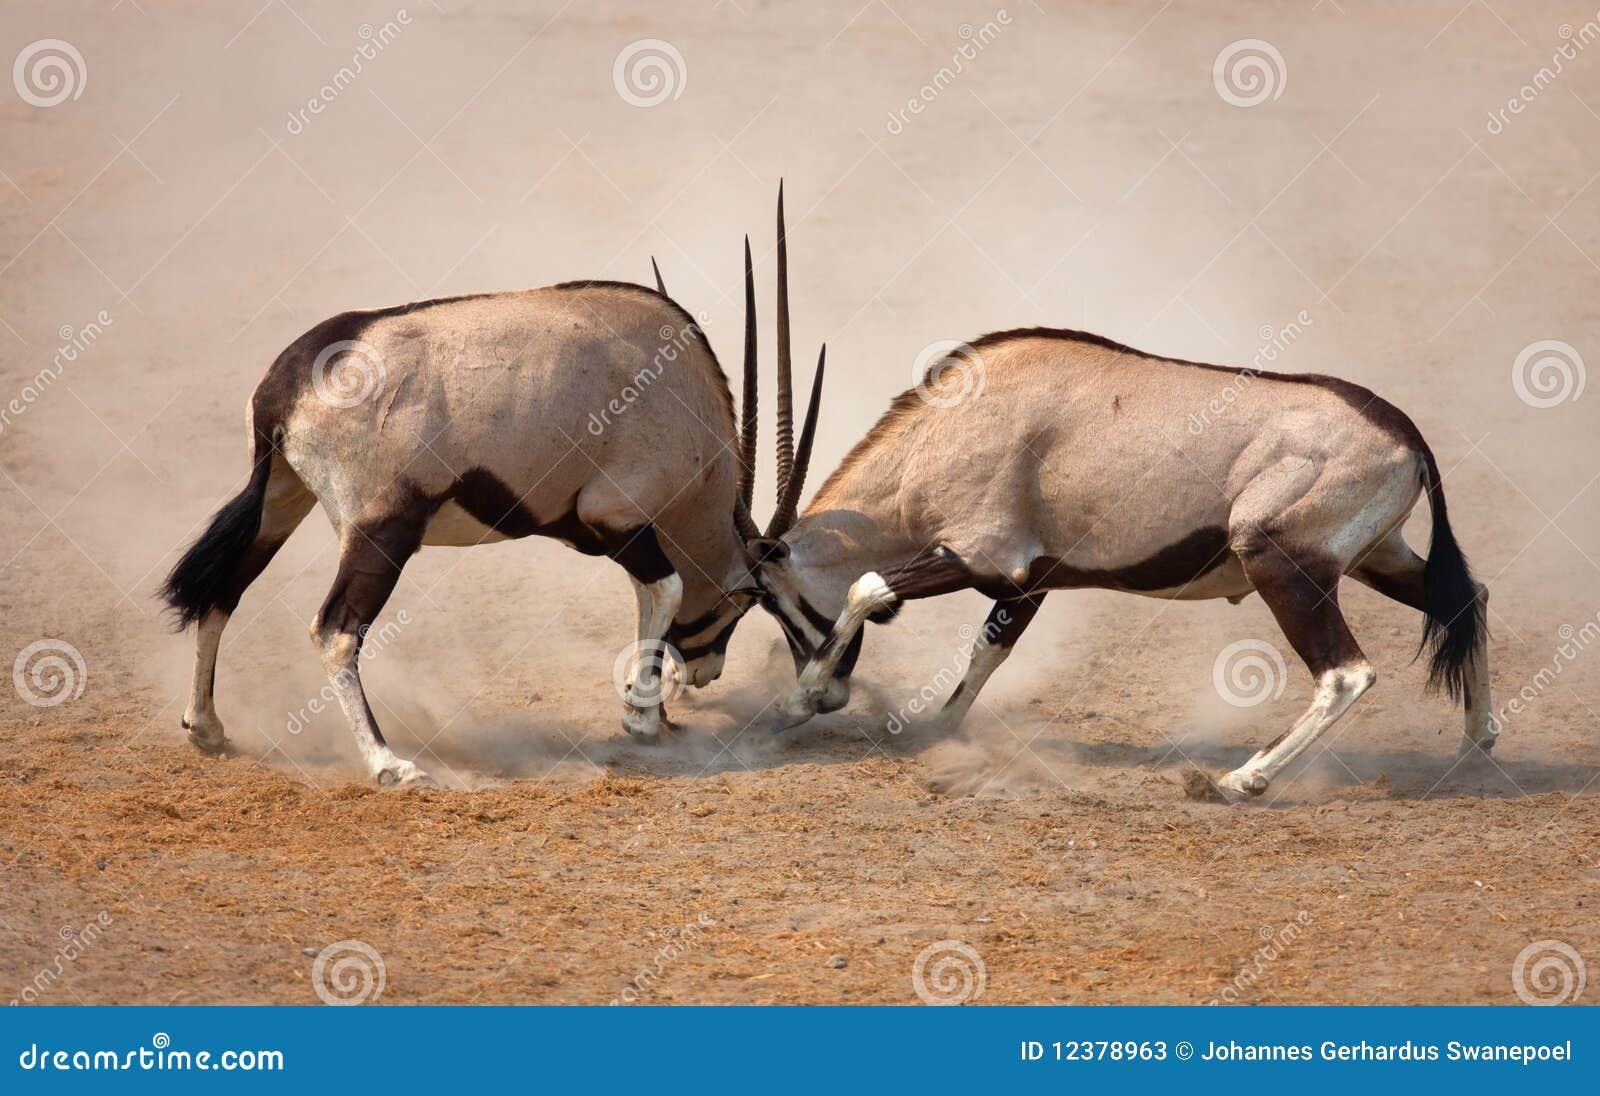 Gemsbok Fight Stock Photos - Image: 12378963